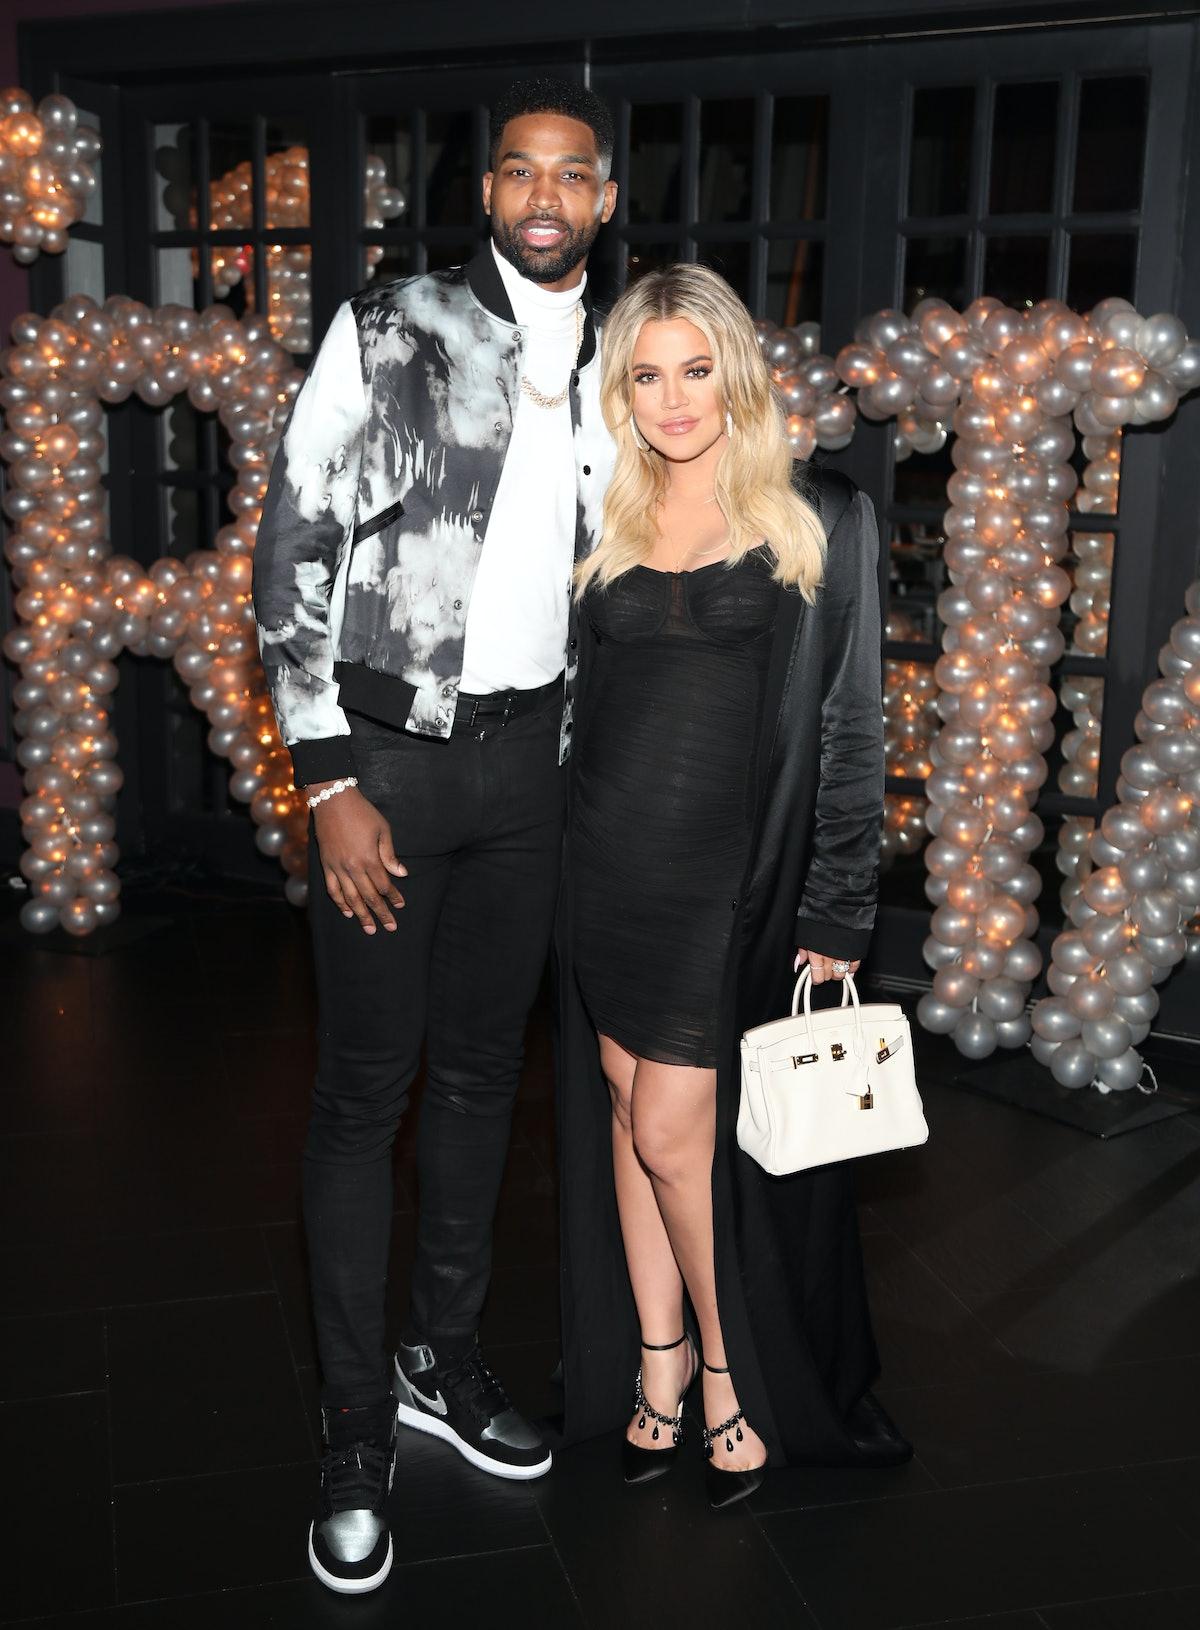 Tristan Thompson and Khloé Kardashian